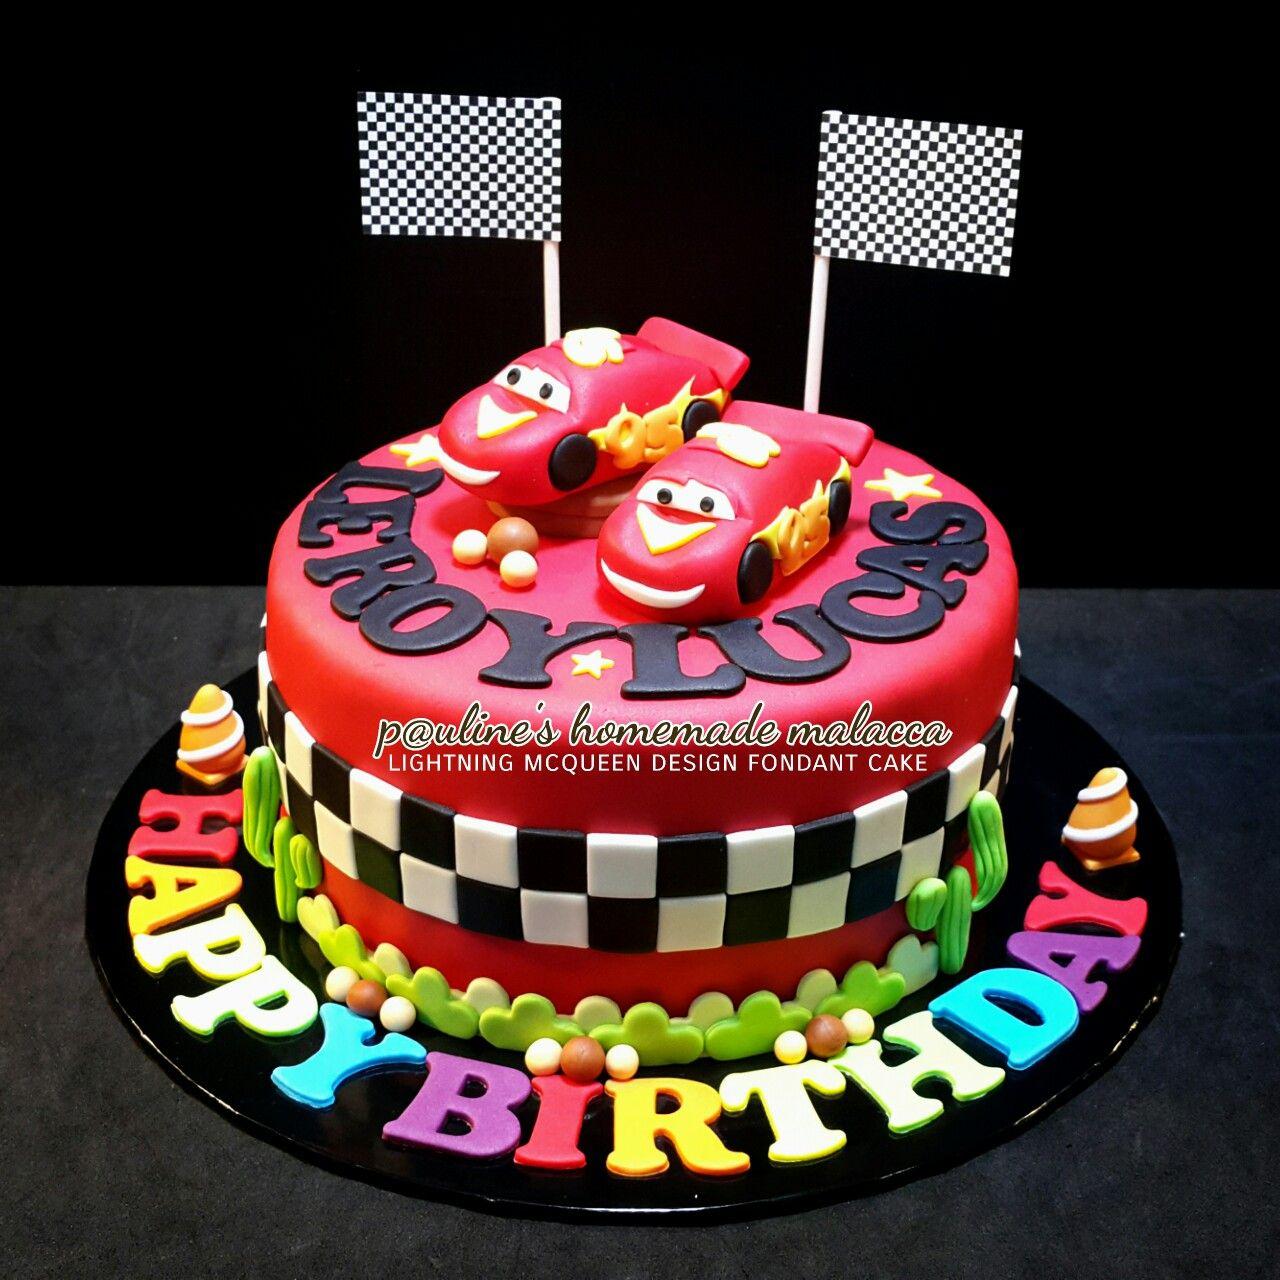 Lightning Mcqueen Design Fondant Cake For Twins Birthday Boy